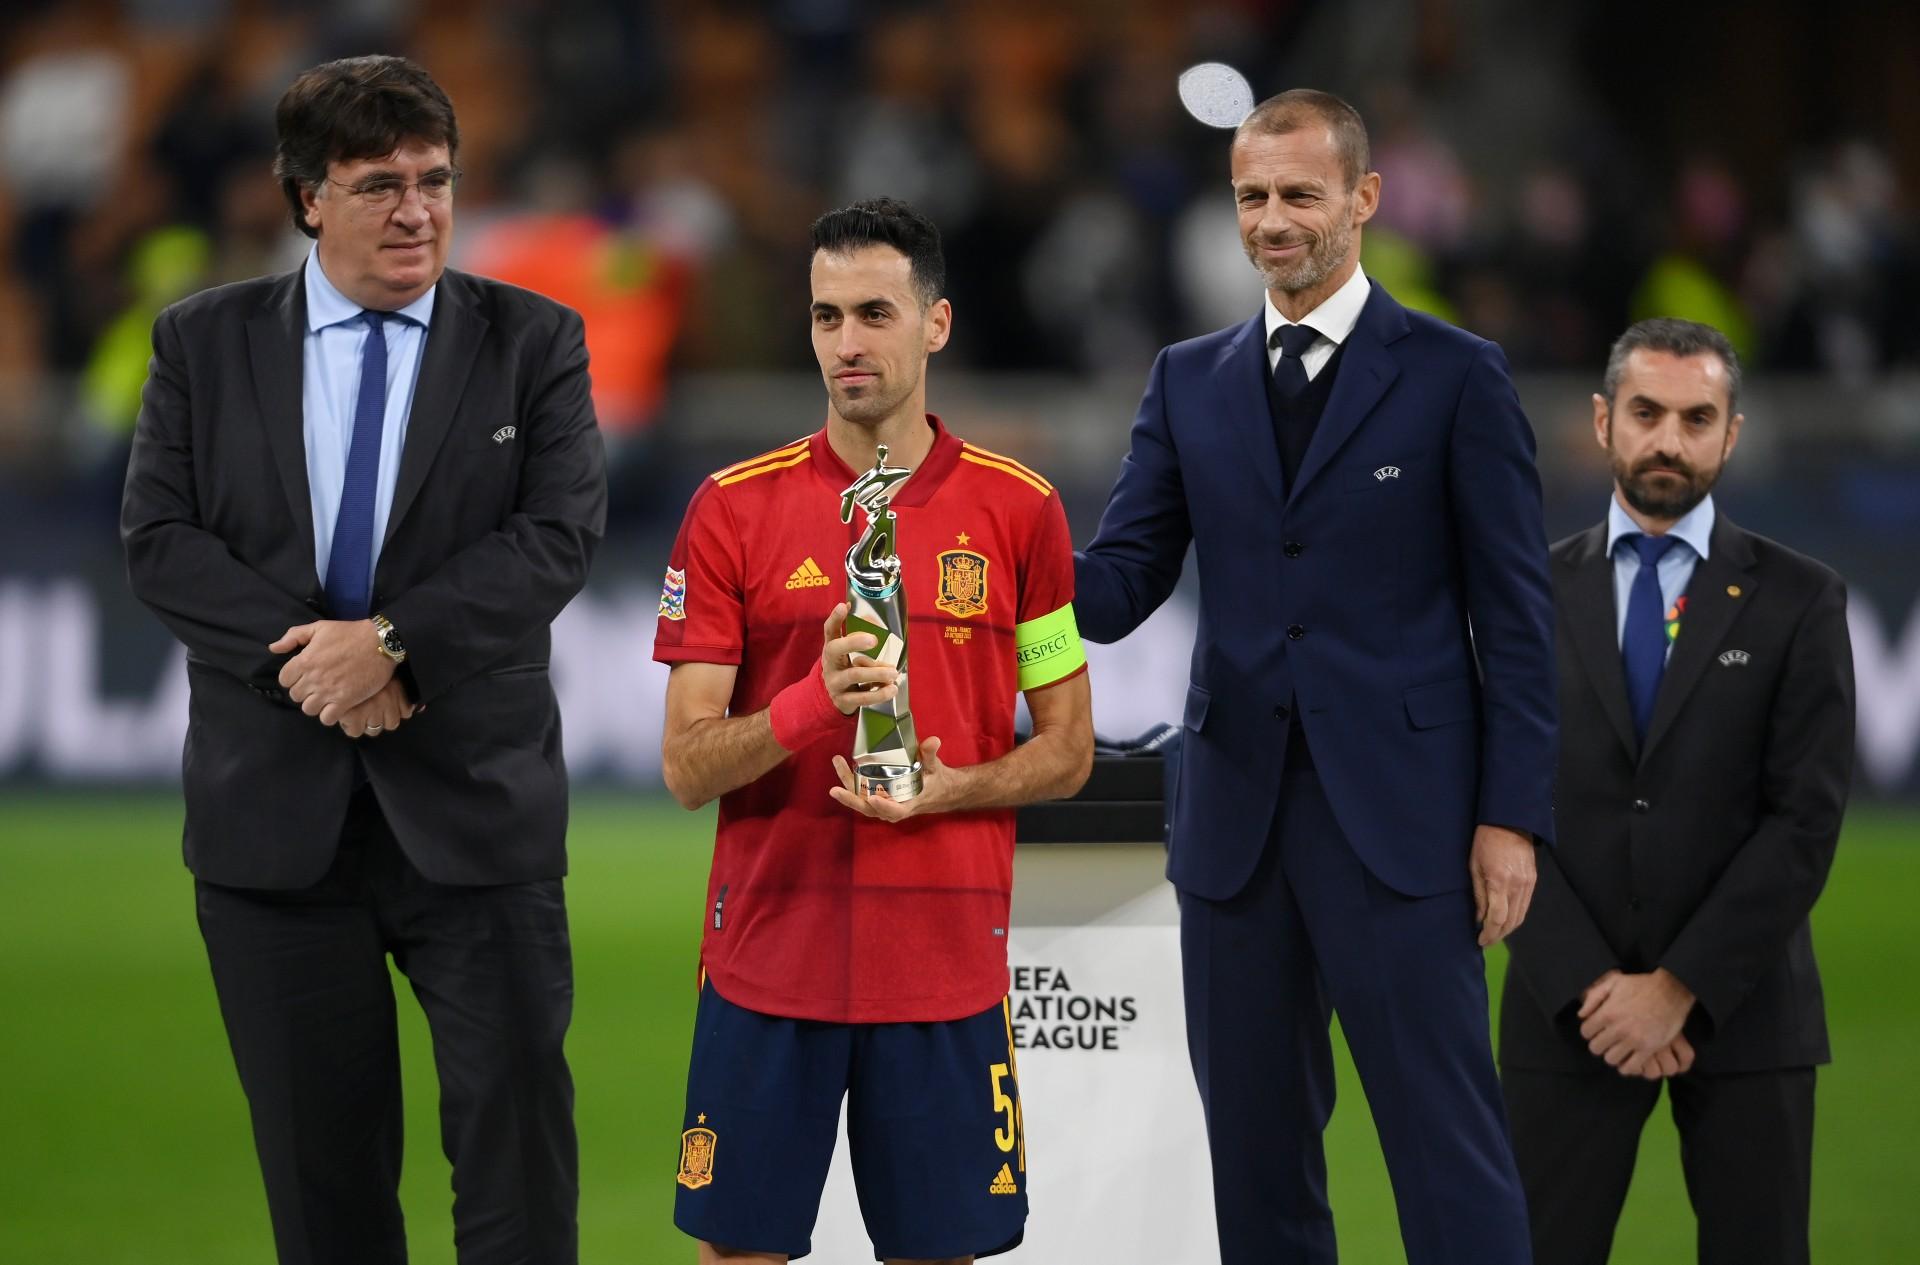 Sergio Busquets: Kylian Mbappe's winner was offside - Football Espana